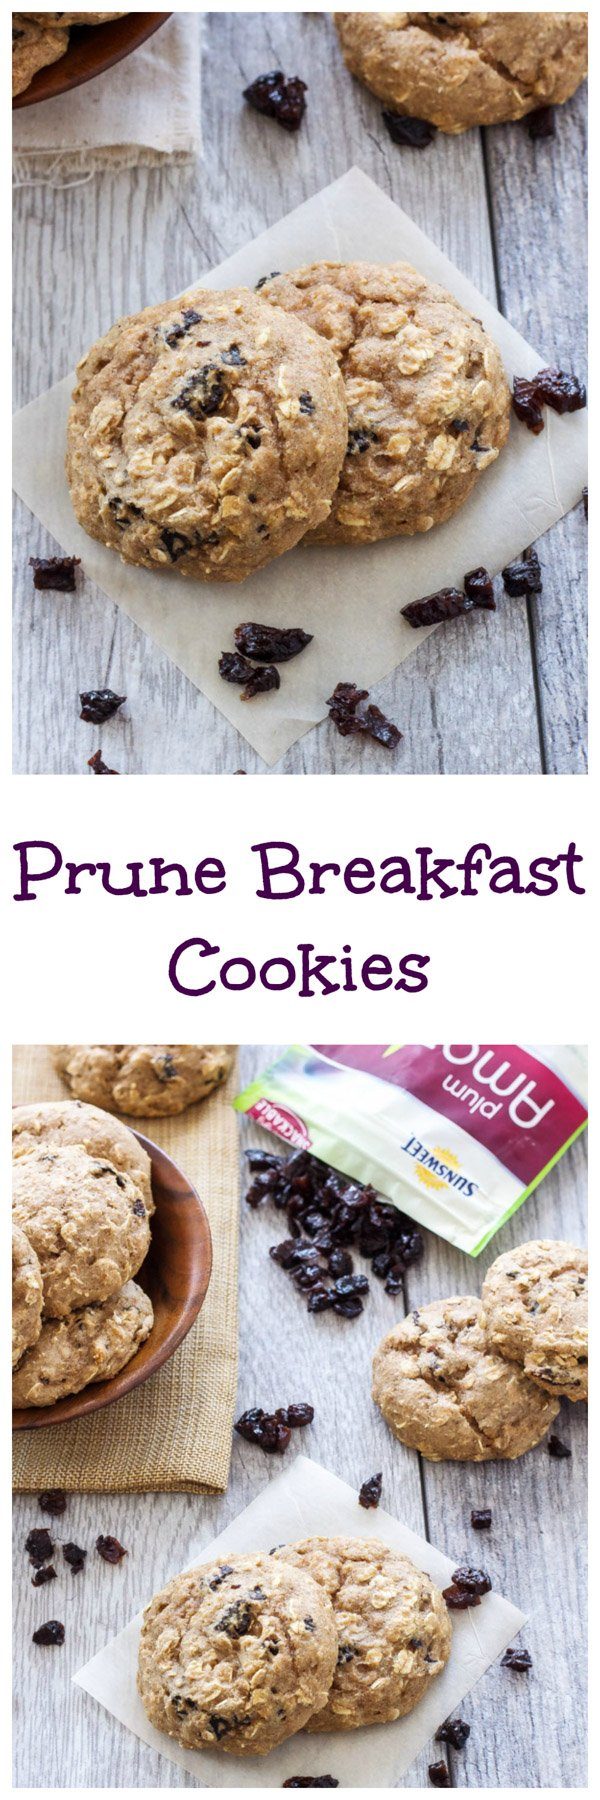 Prune Breakfast Cookies   Delicious and healthy breakfast cookies full of sweet diced prunes!   www.reciperunner.com